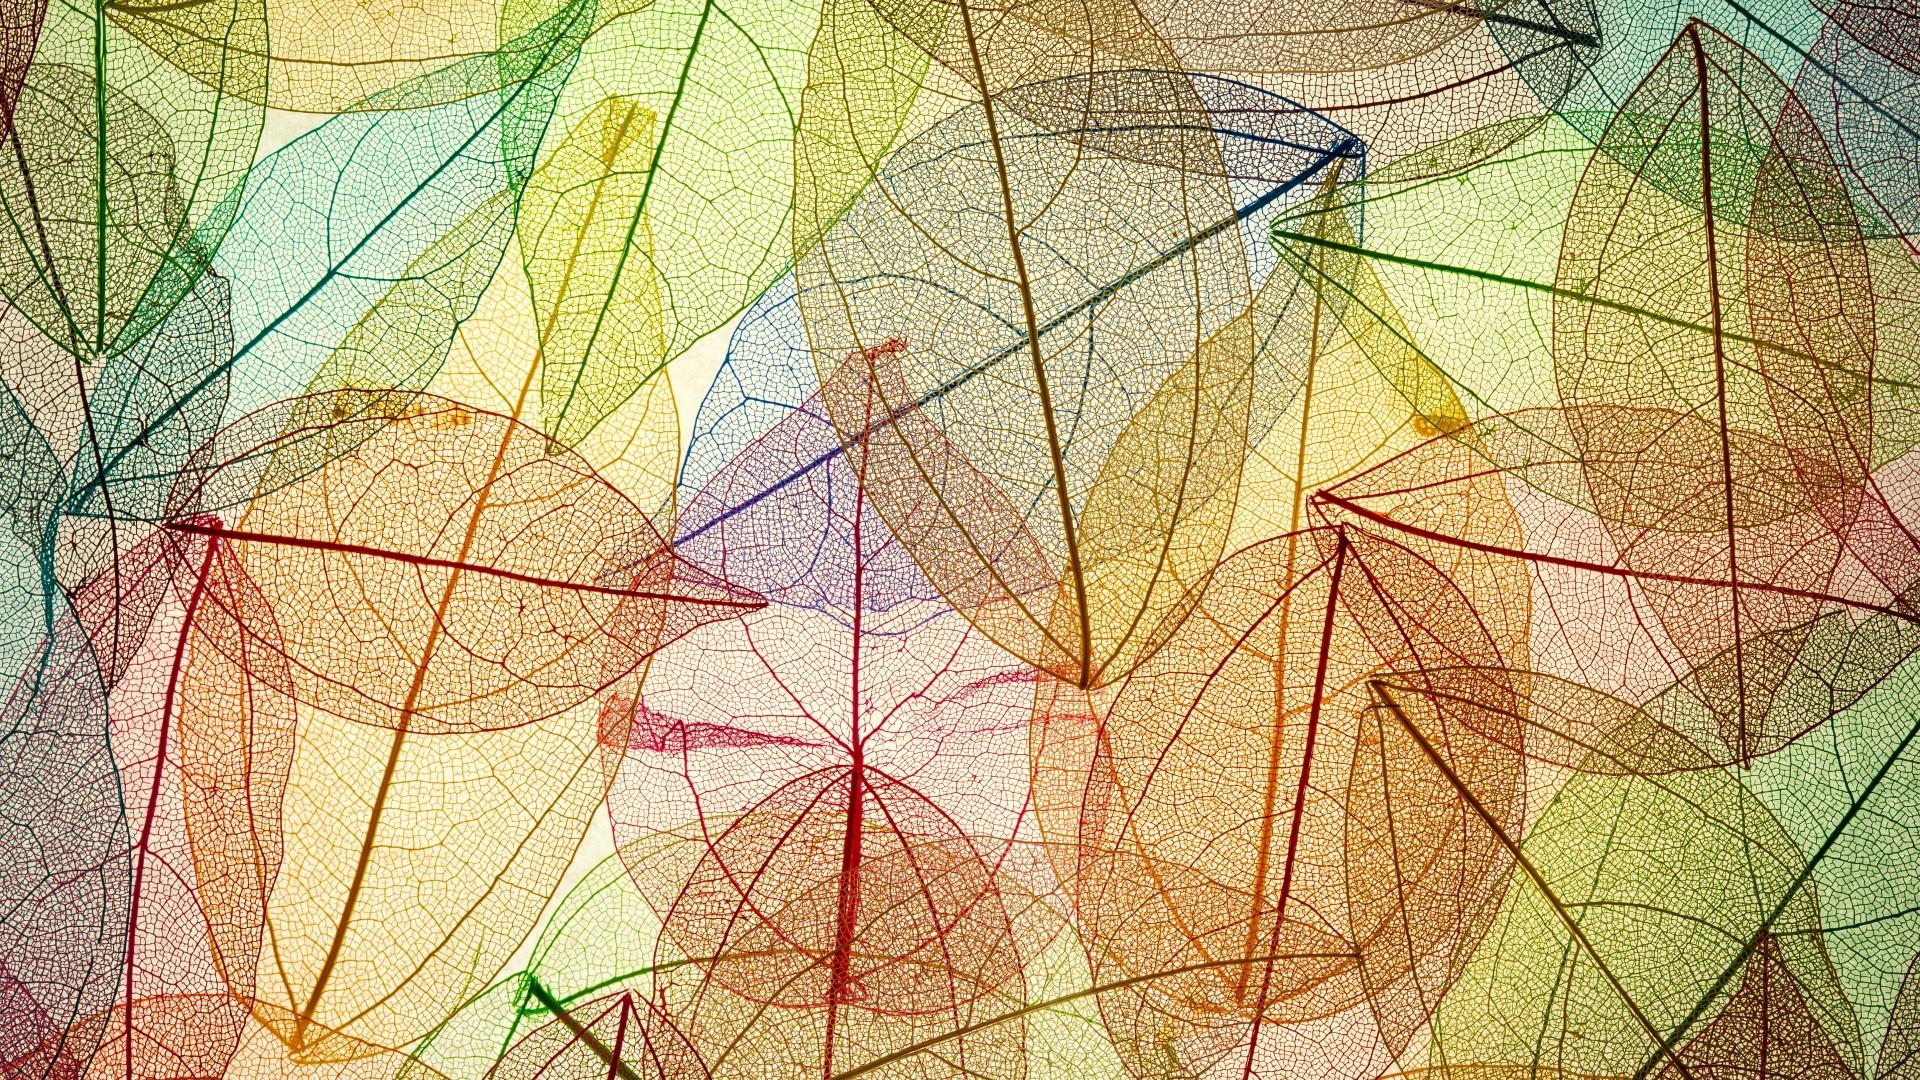 Fondos de pantalla : luz de sol, dibujo, vistoso, otoño, hojas ...